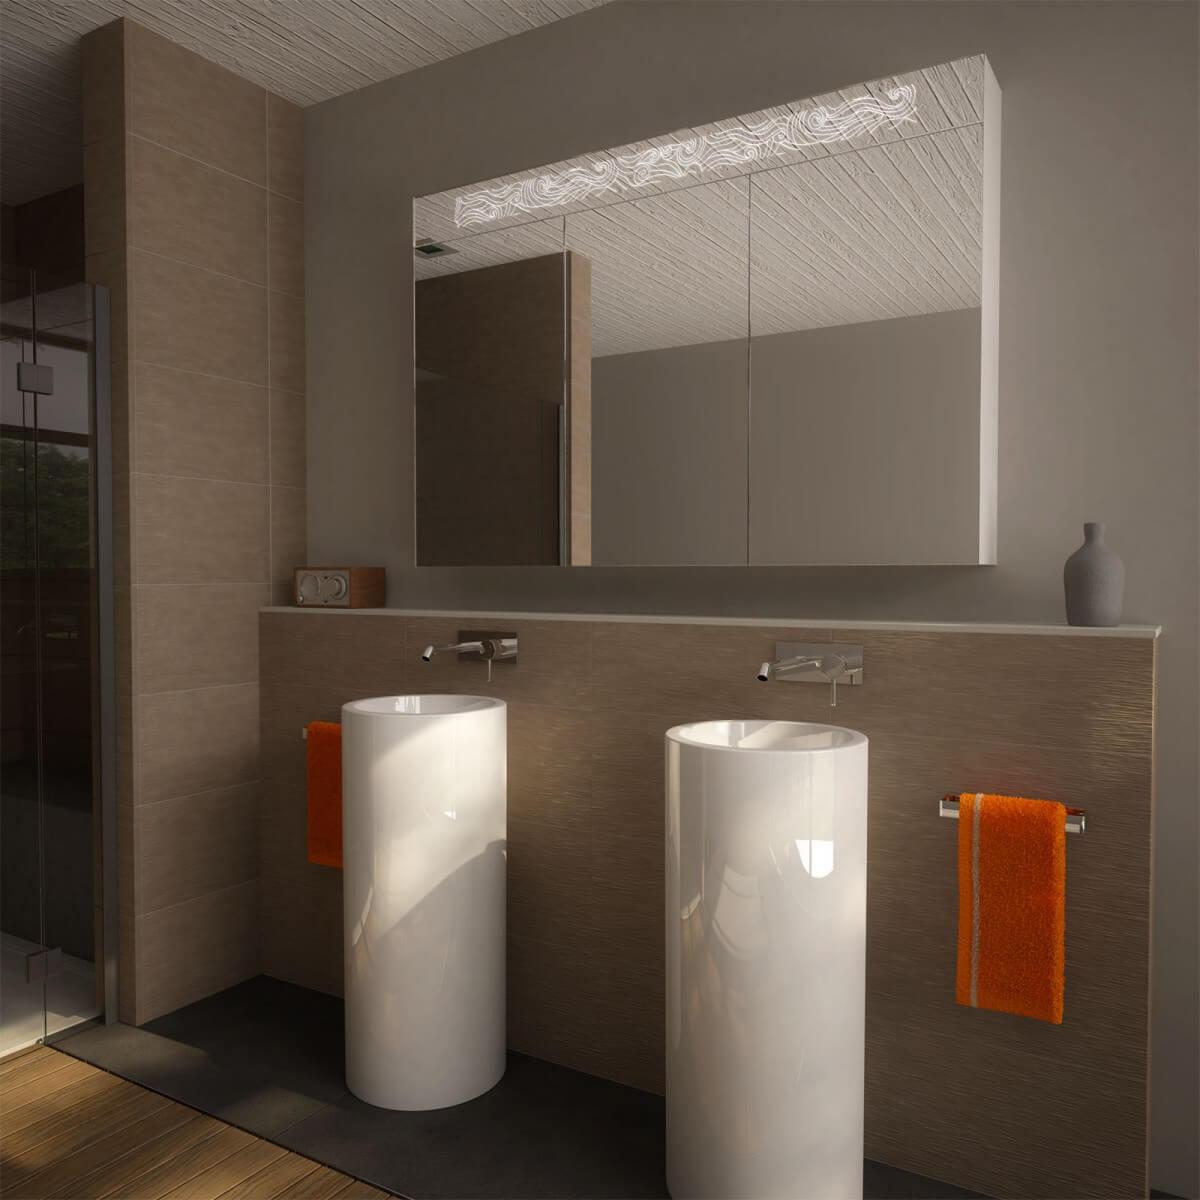 Spiegelschrank LED nach Maß mit Aluminium-Korpus - Toronto